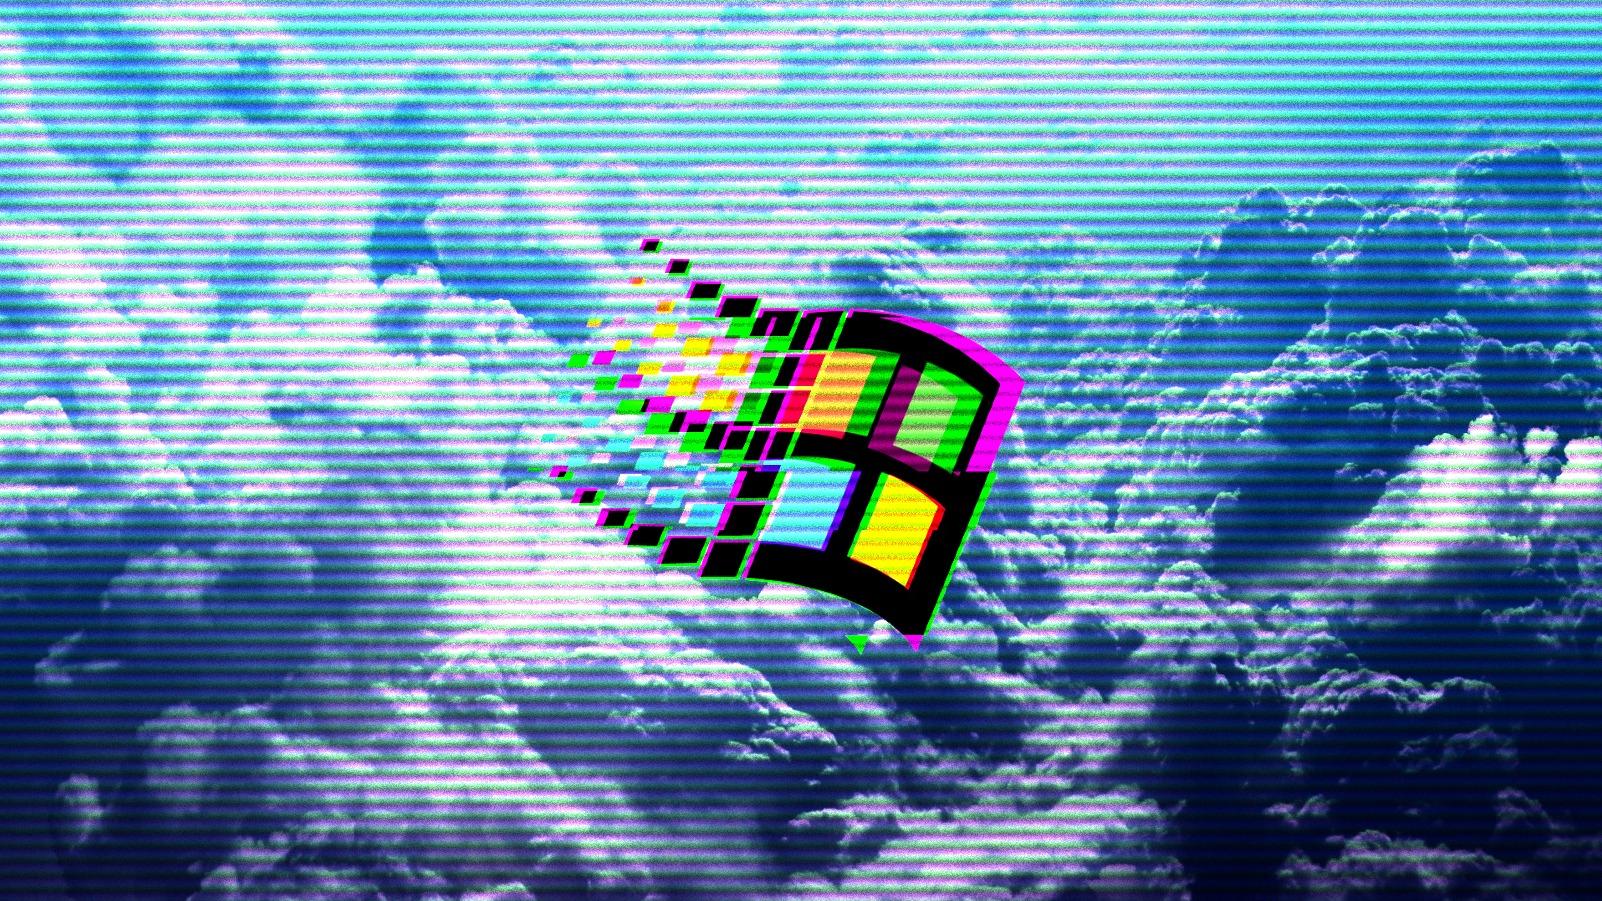 Wallpaper Vaporwave 1990s Windows 95 Windows 98 Clouds